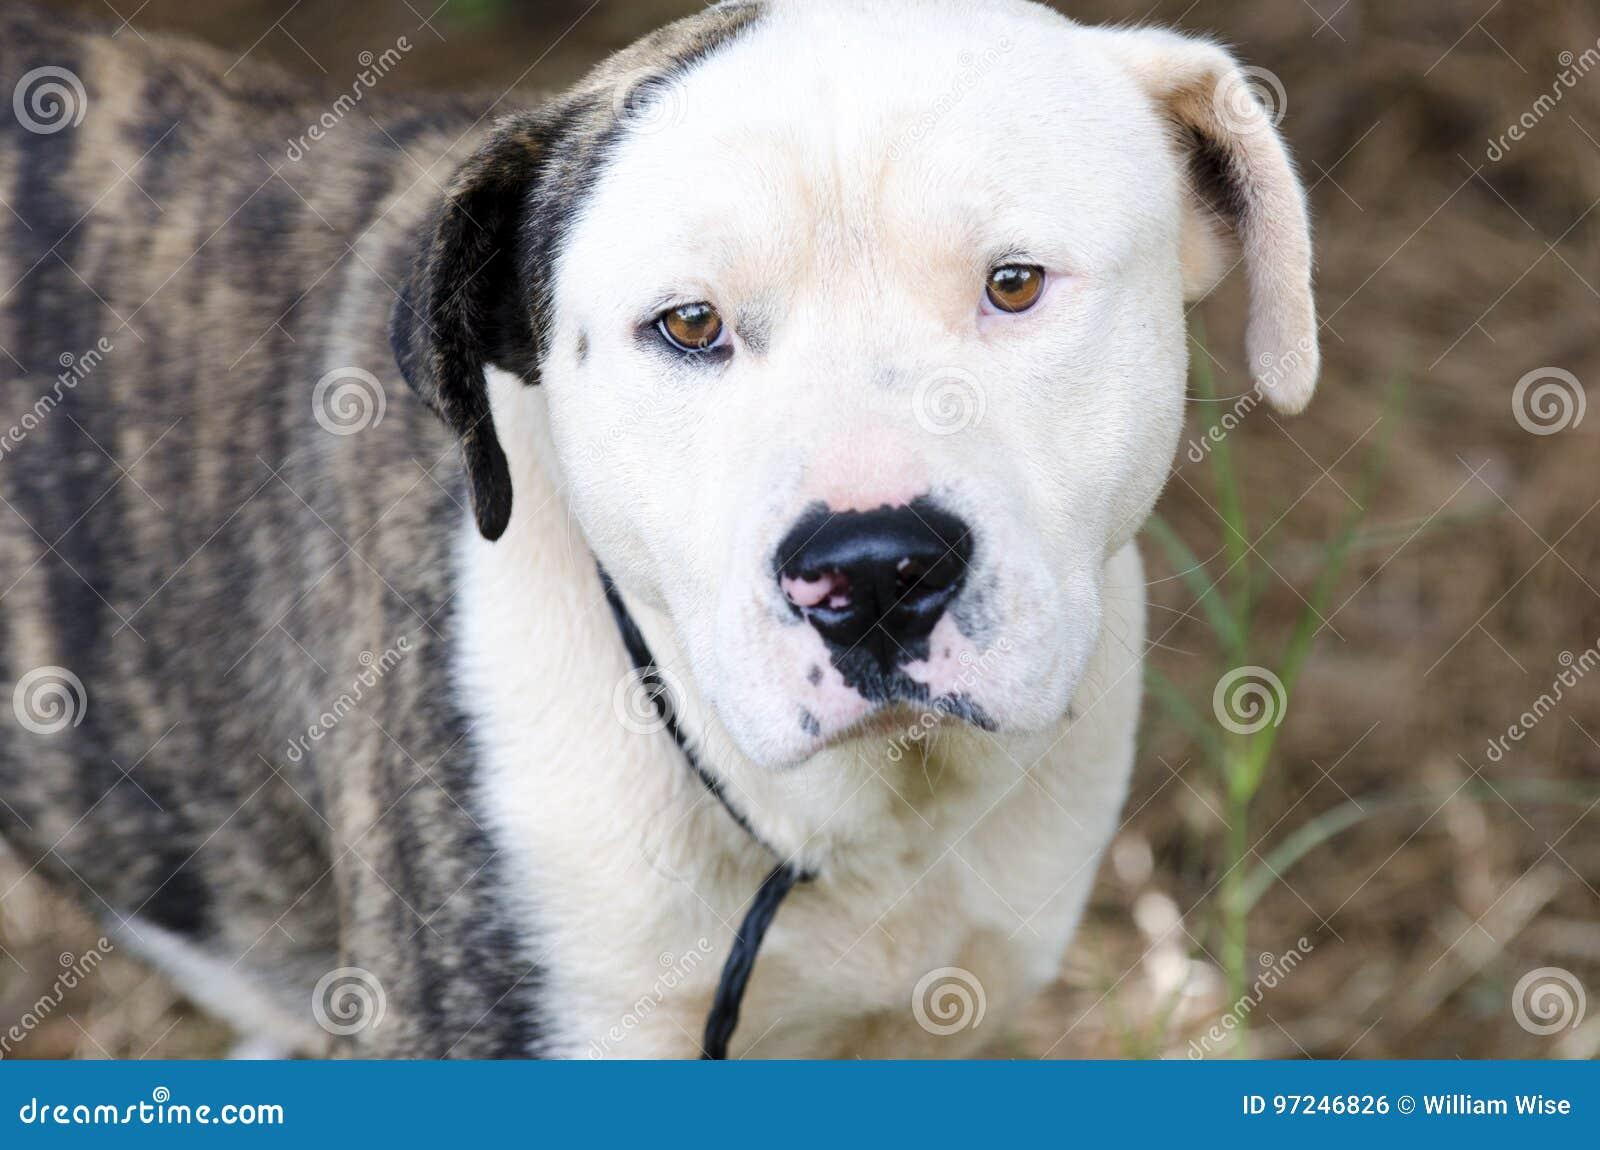 Brindle and white American Bulldog Anatolian mixed breed dog